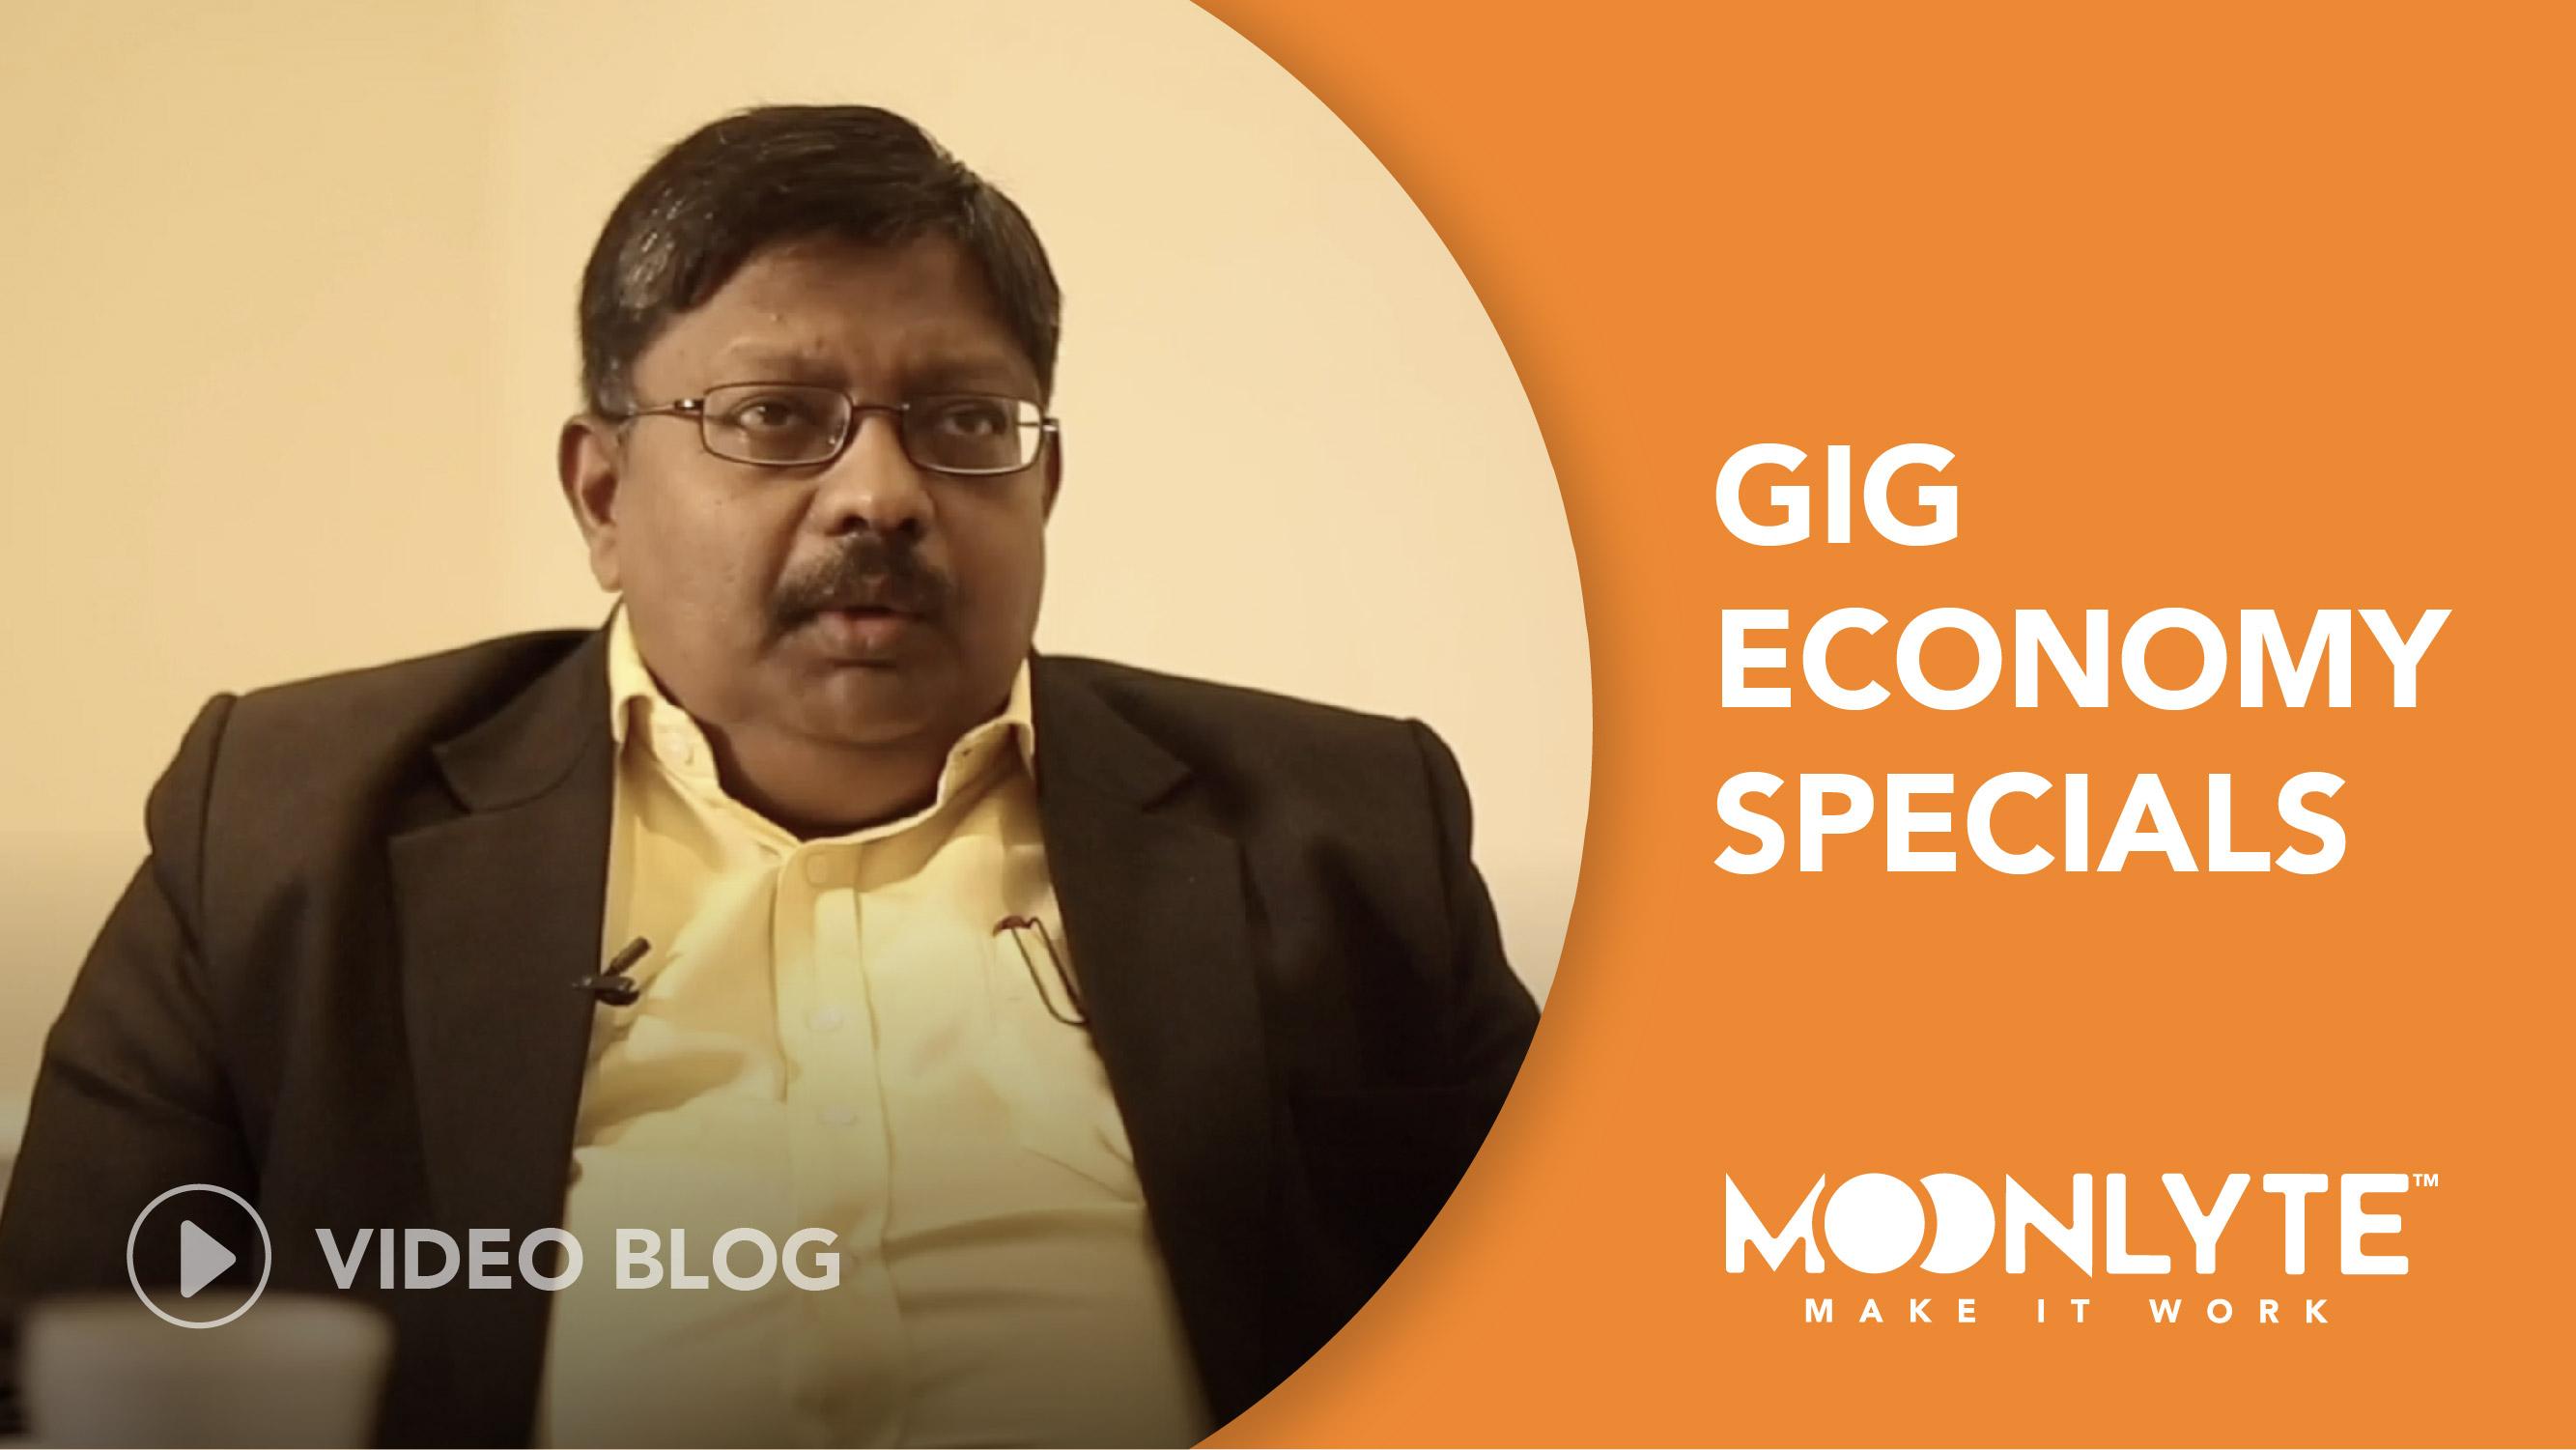 Peter Yorke - Gig Economy Specials